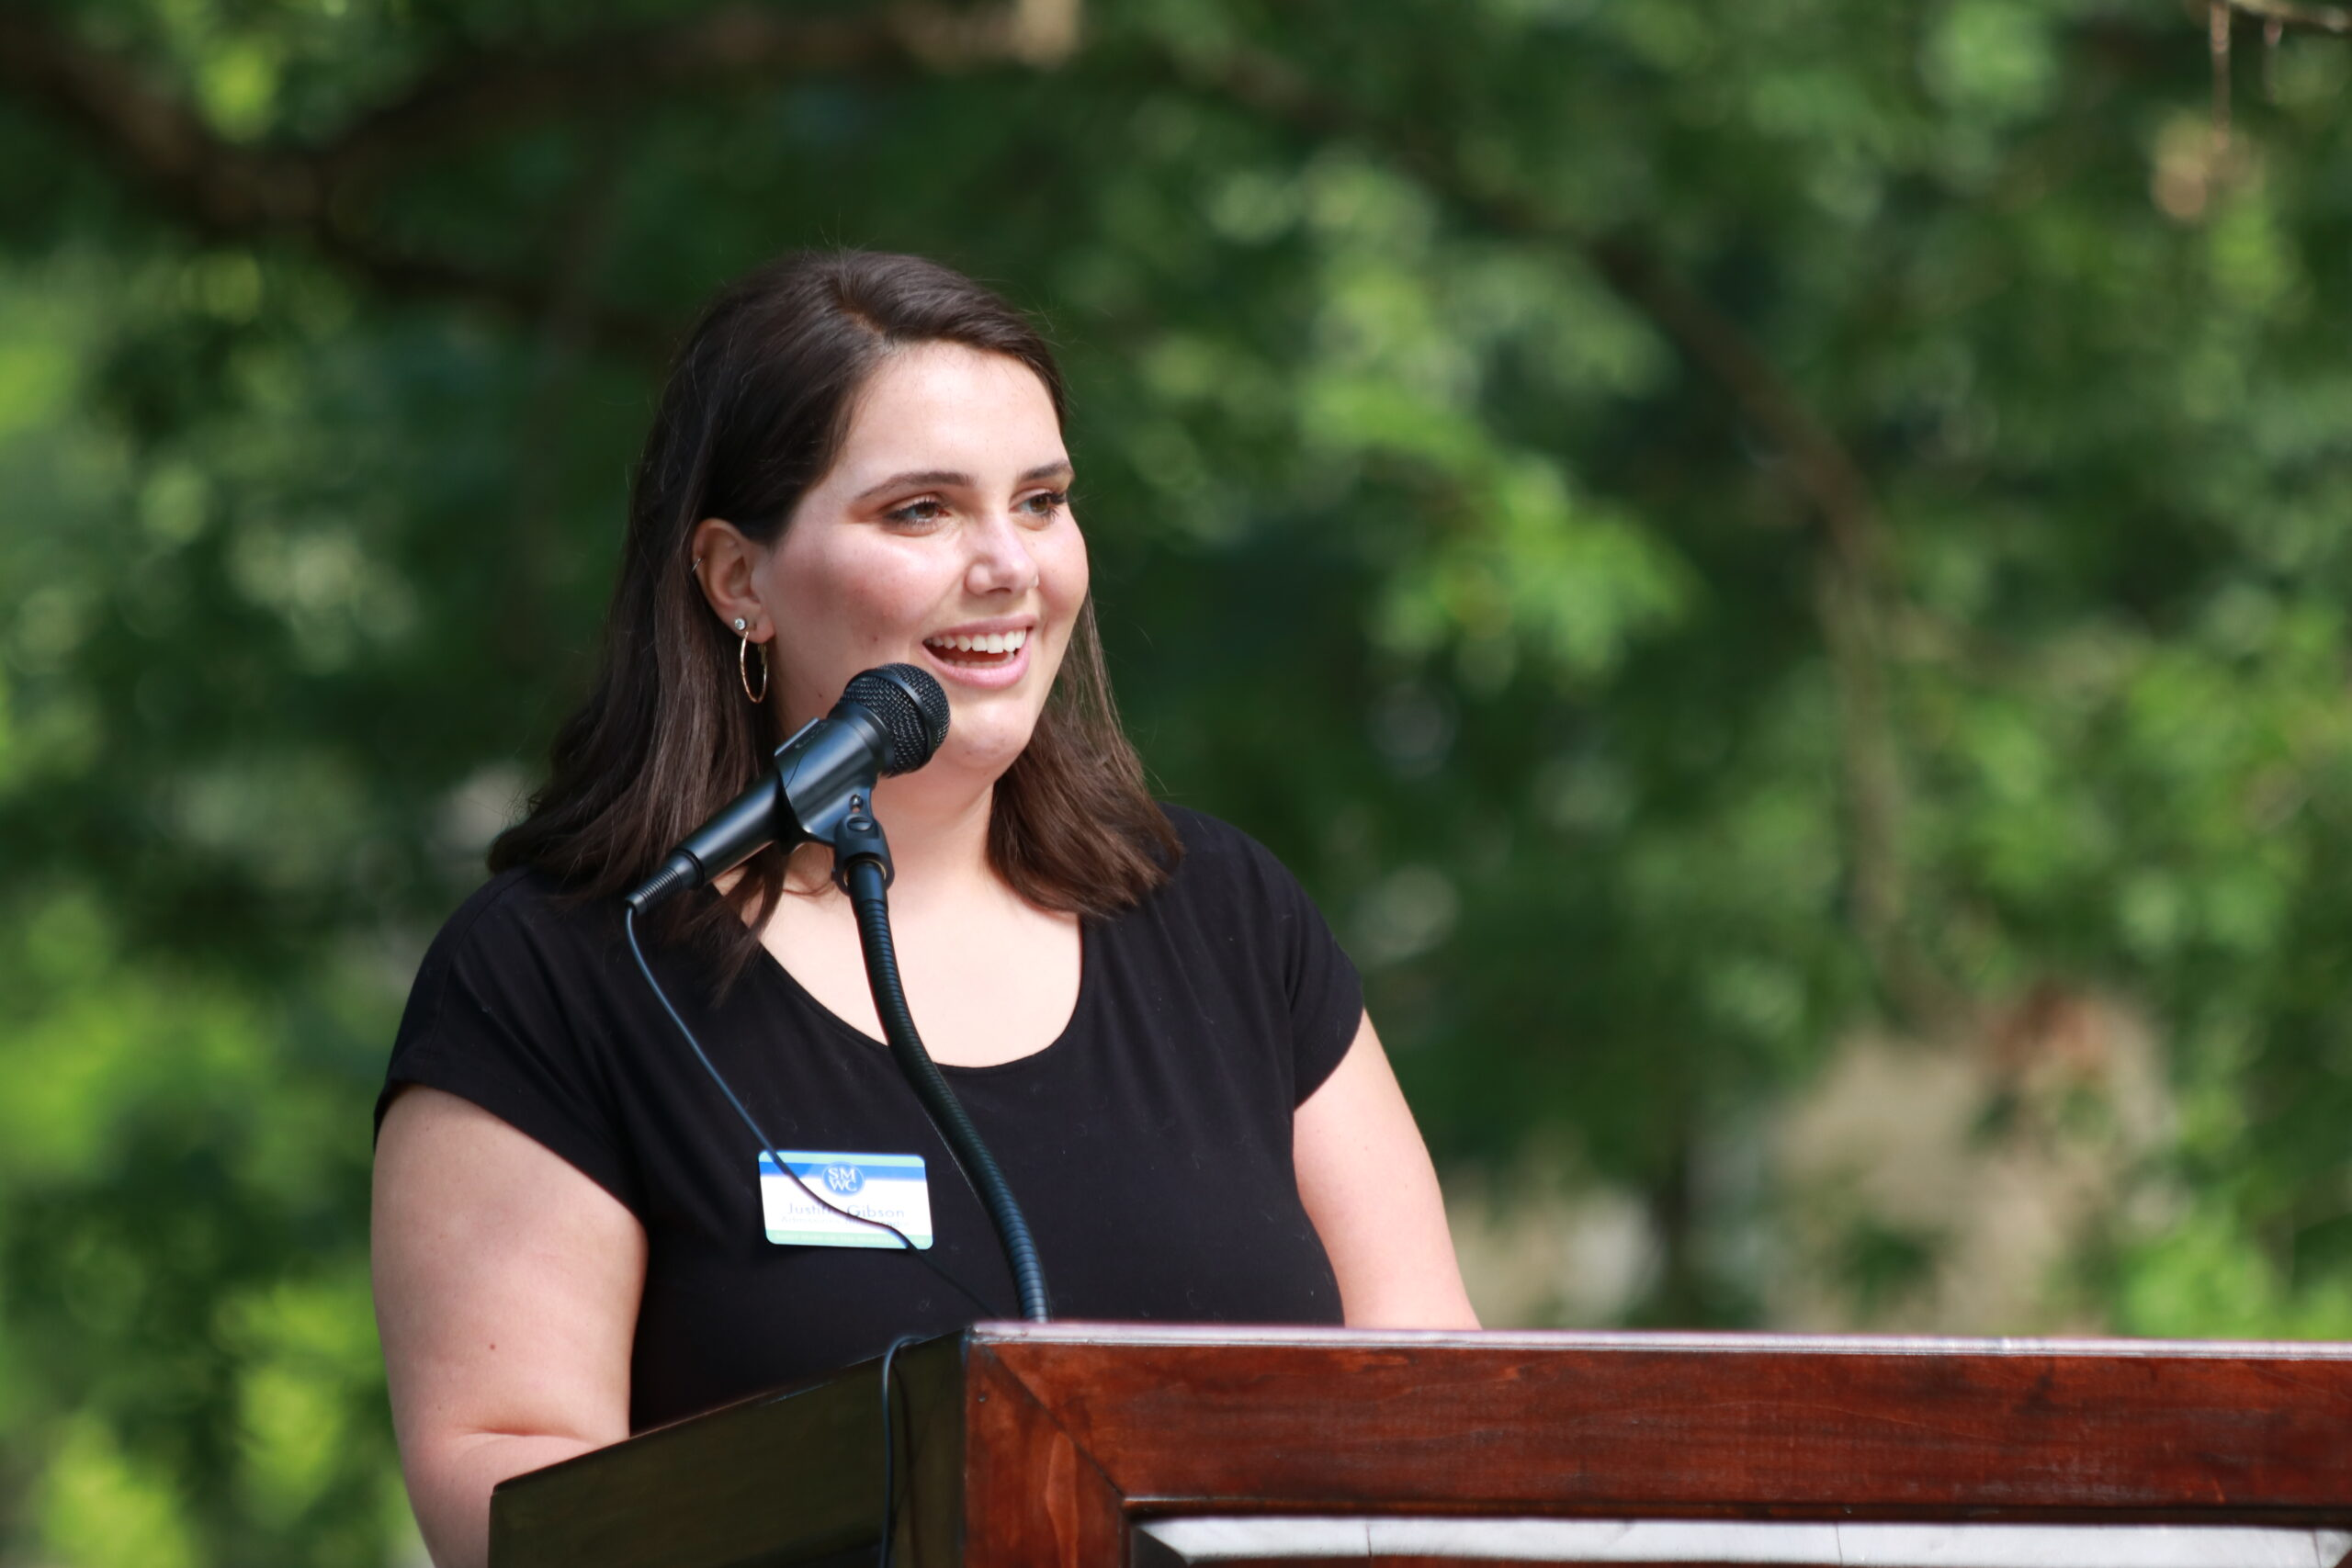 Justine Gibson speaking at the groundbreaking